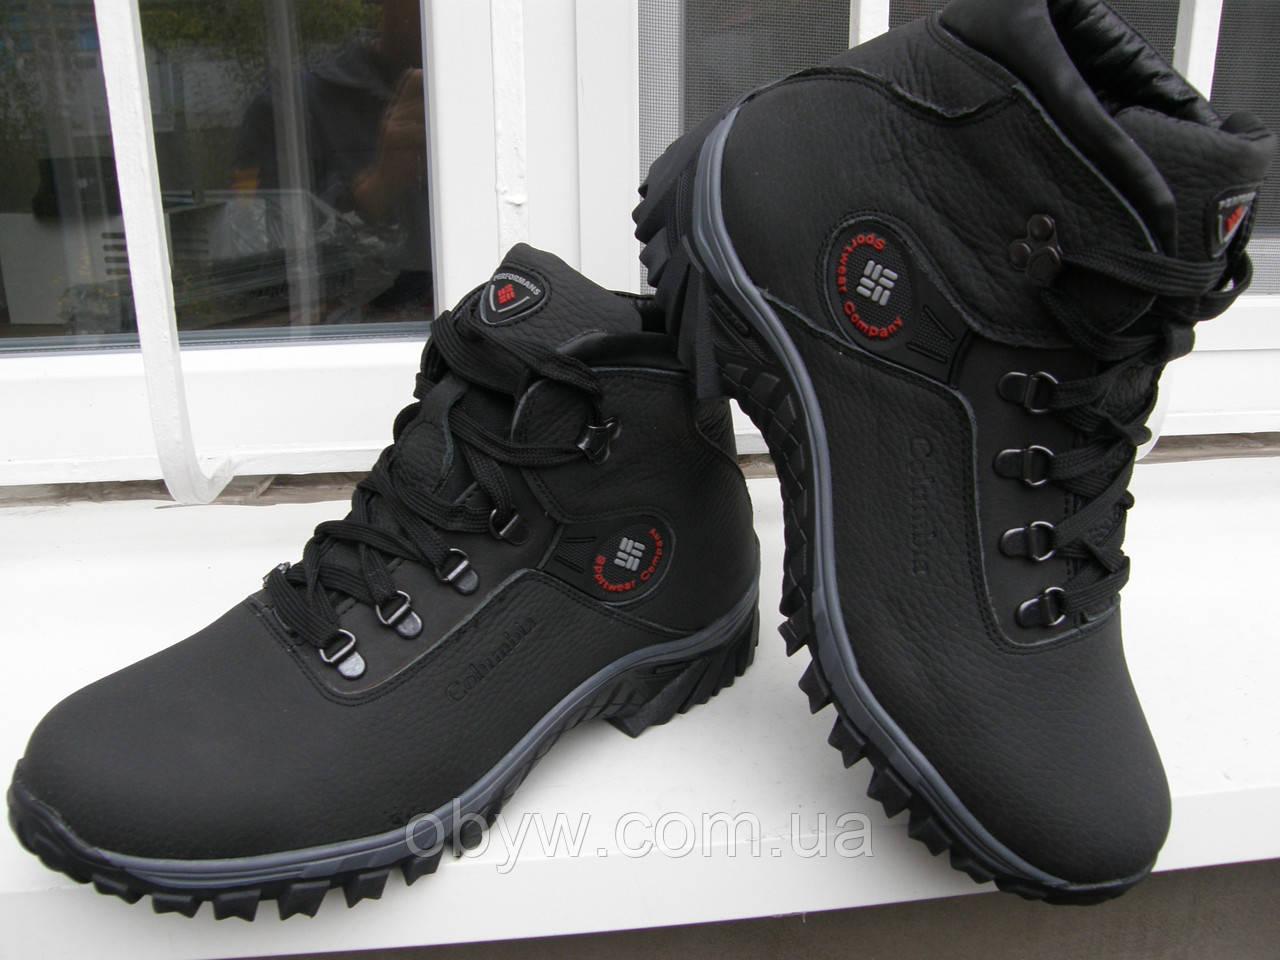 Зимняя обувь Cаlambia для мужчин